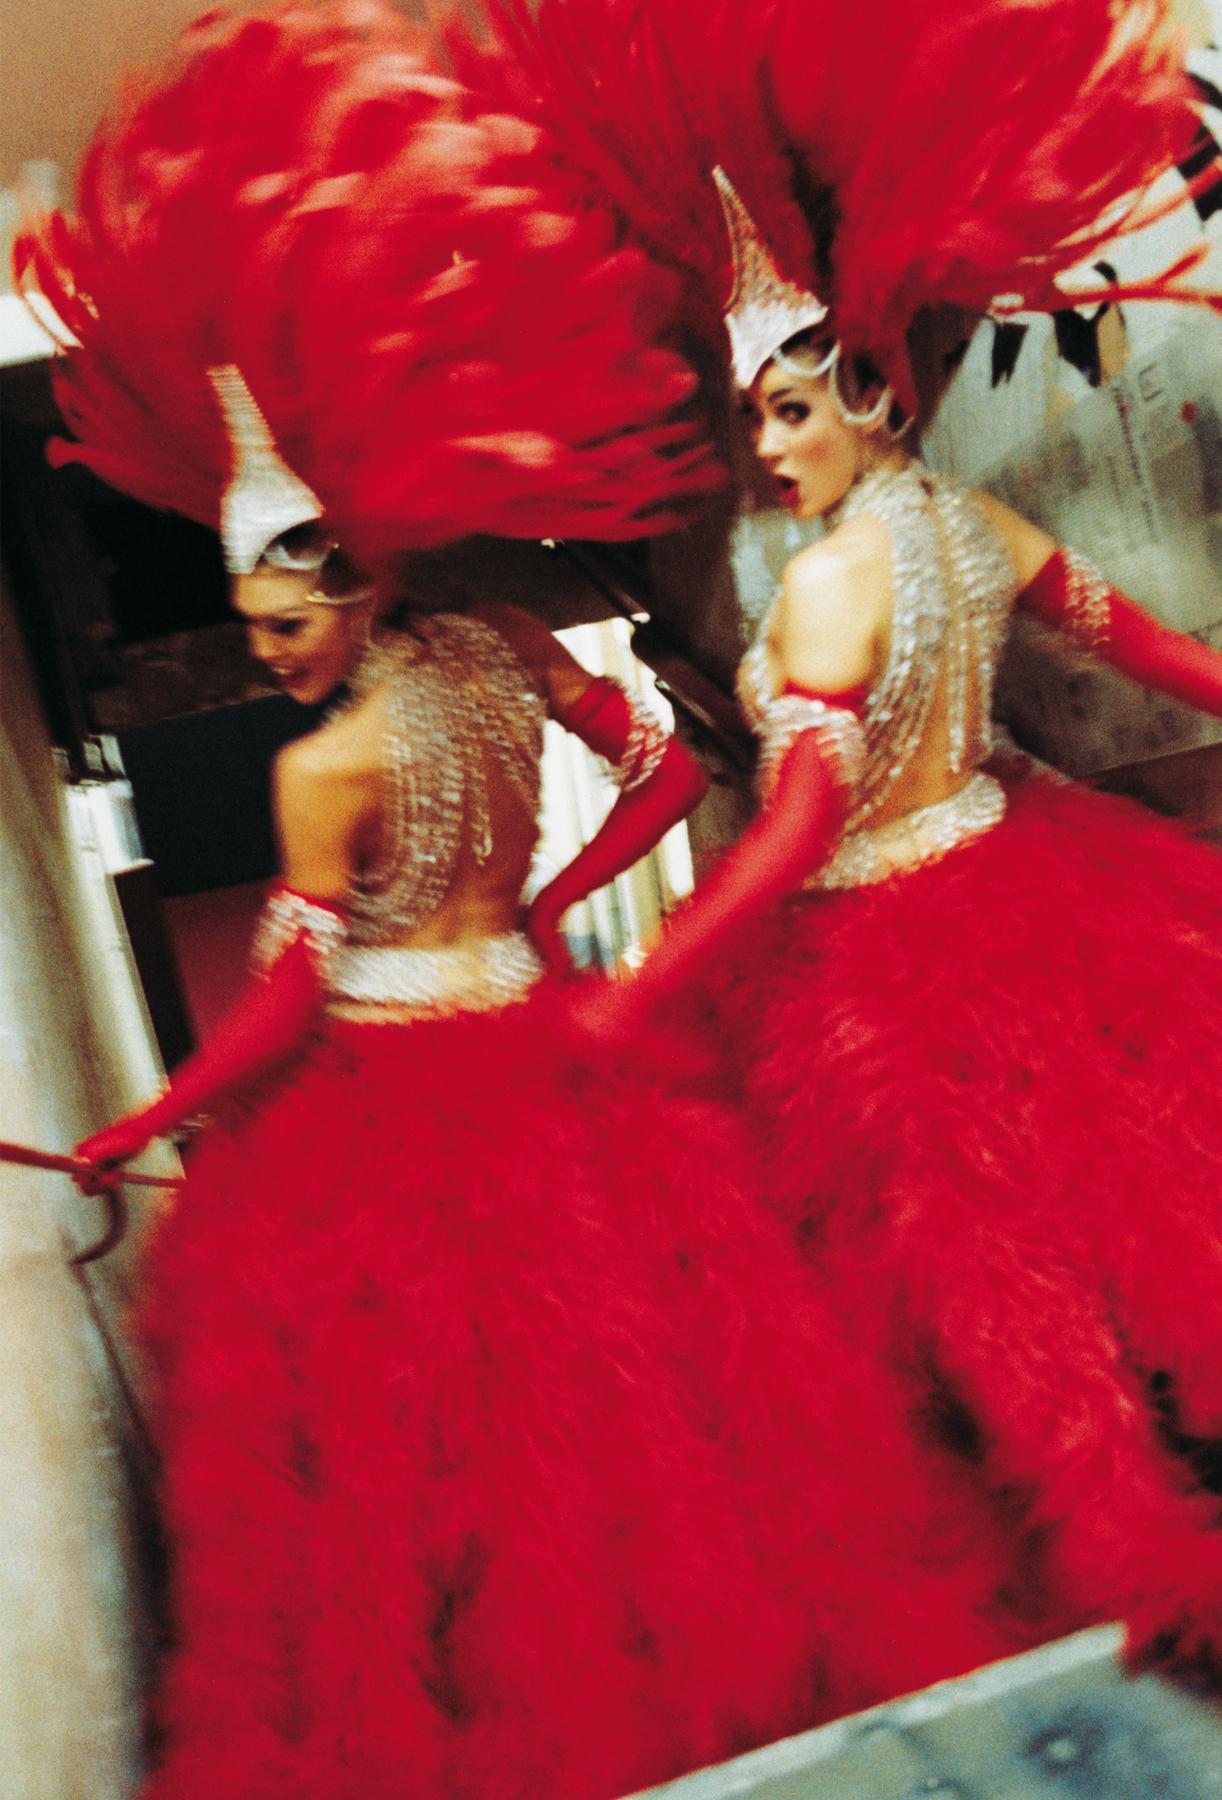 Moulin-Rouge-Girls-Paris-2001-1222x1800q2.jpg